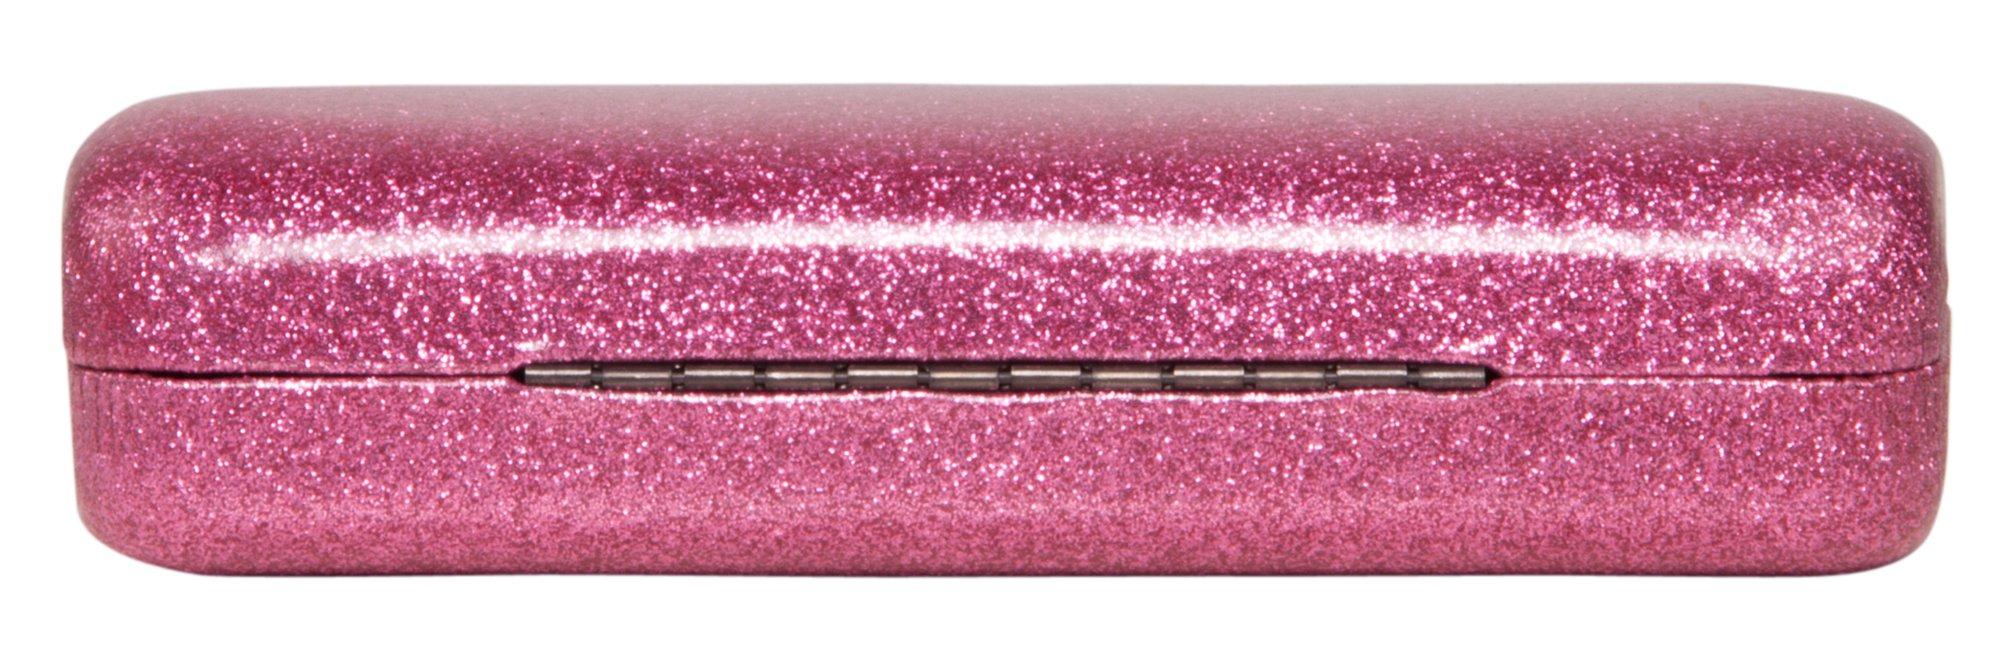 Poetic Pink Medium Premium Fashion Women's Hard Eyeglasses Case By Spunky Soul   Glitter Light Pink   Bonus Cleaning Cloth by SPUNKYsoul (Image #3)